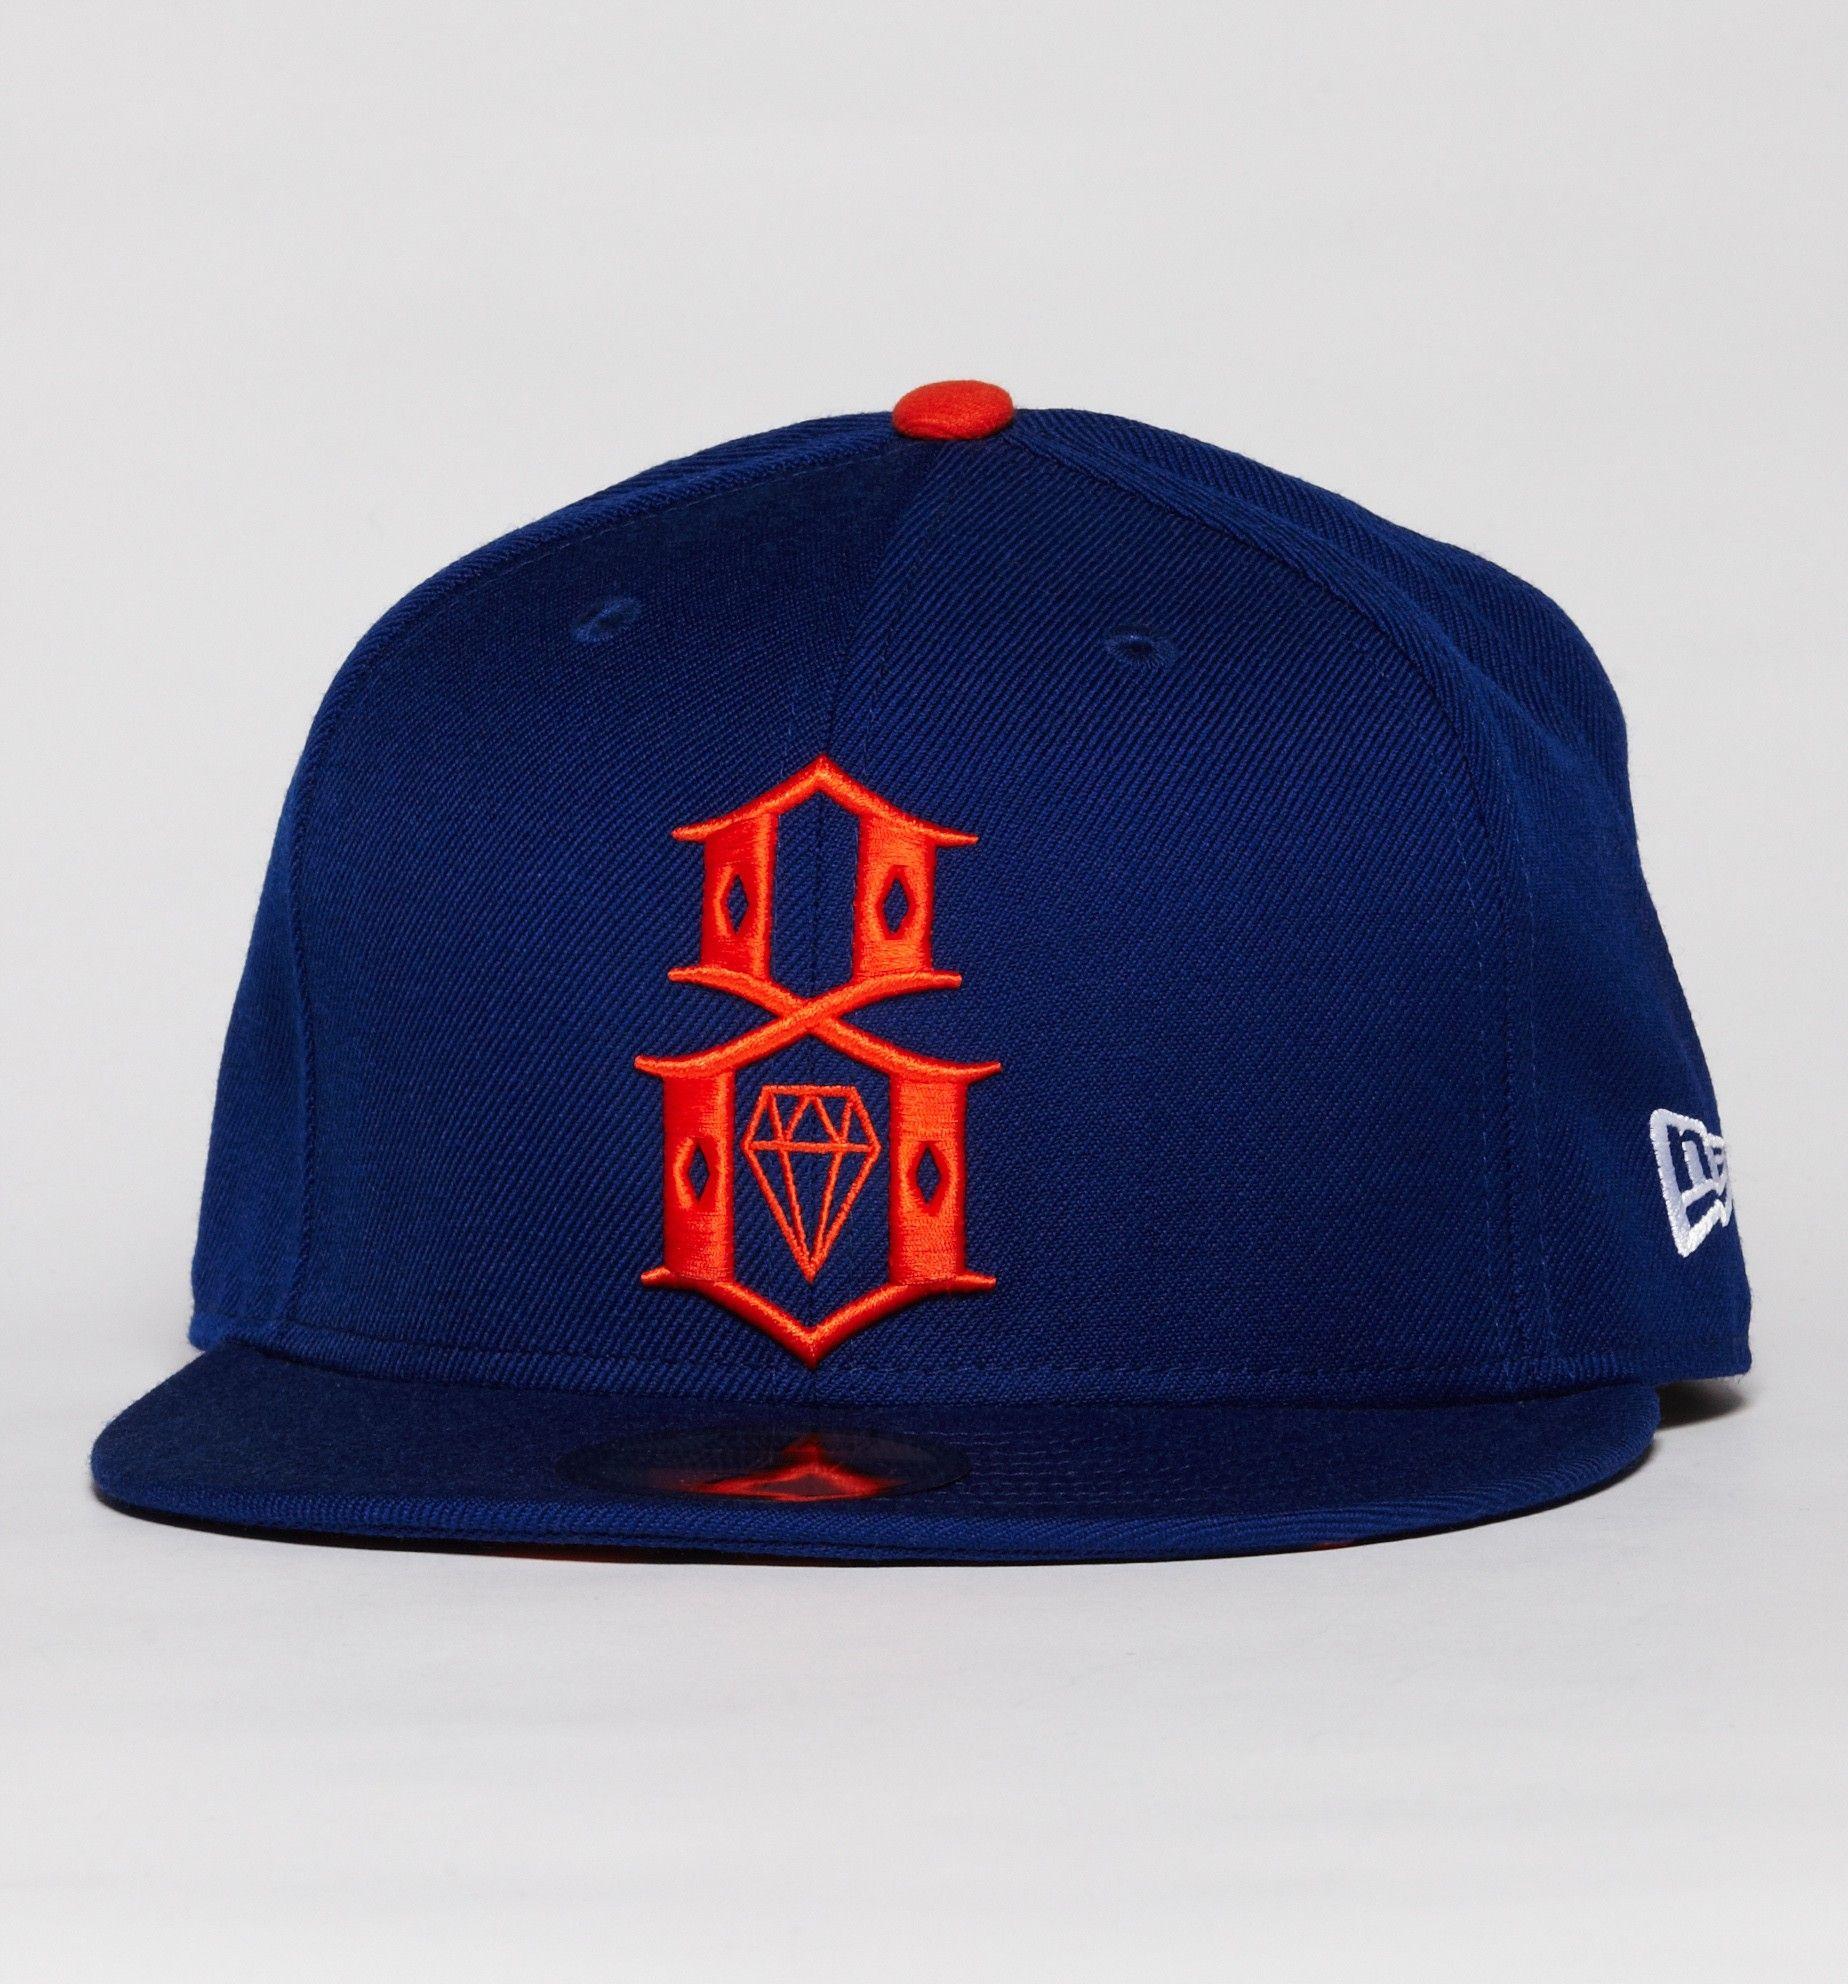 Rebel8 Logo New Era New Era Logo New Era Fitted Baseball Caps